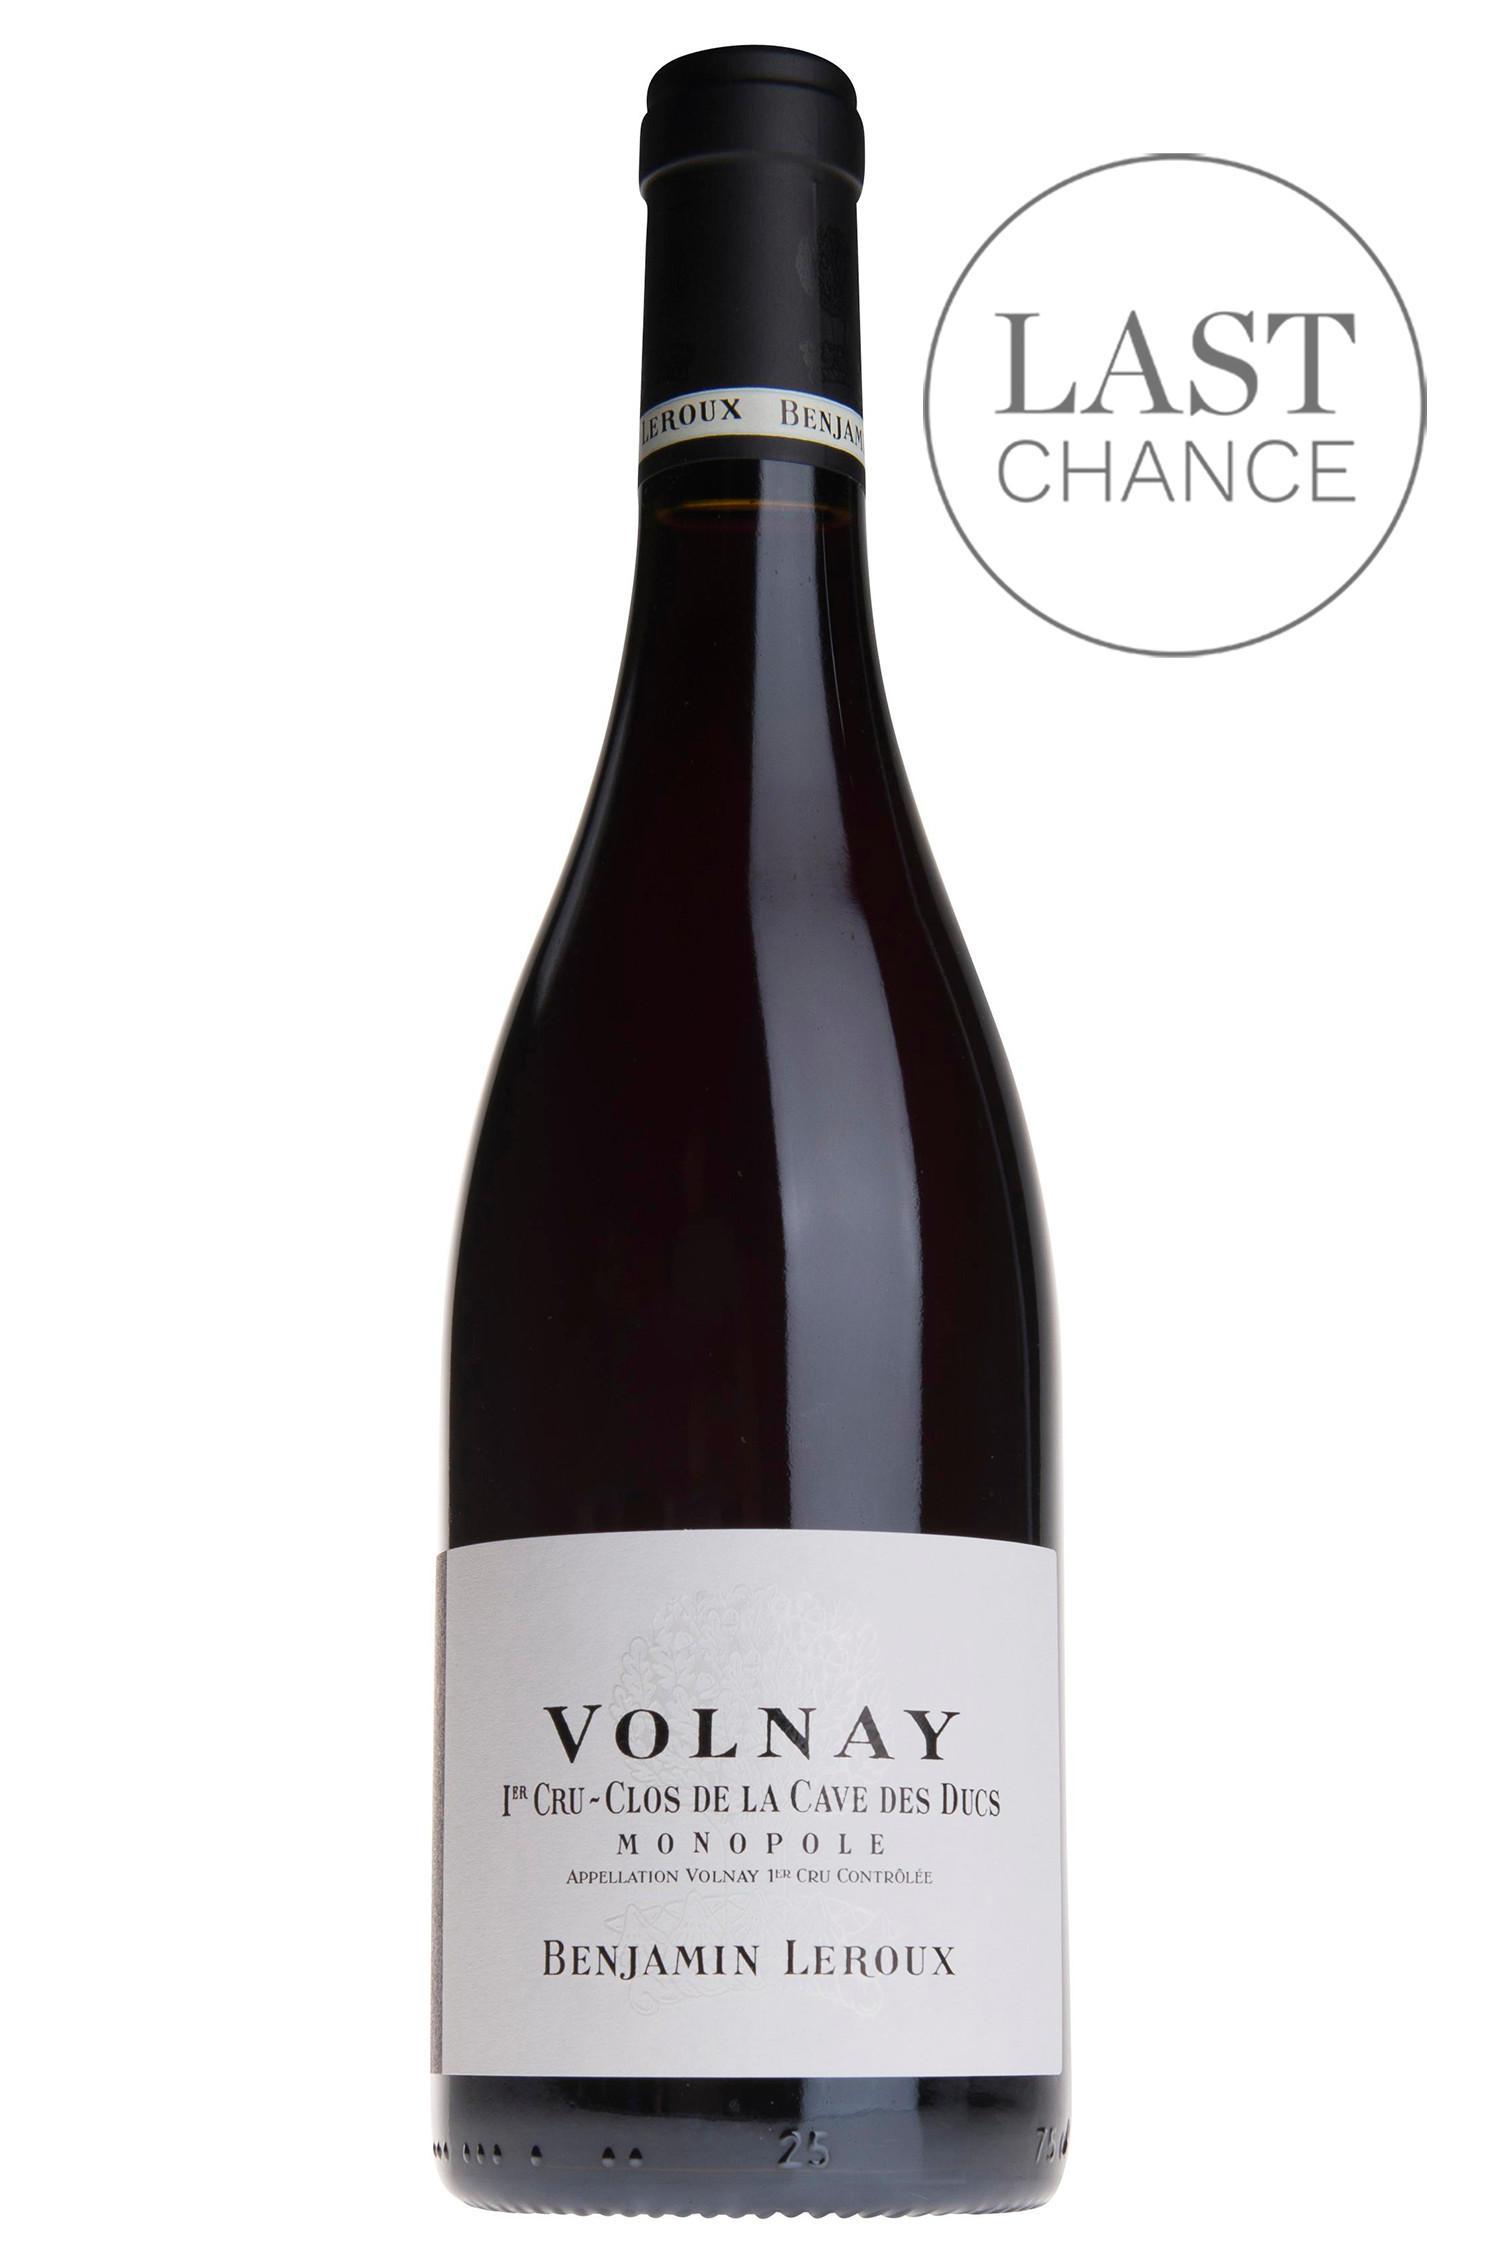 Buy 2017 Volnay Clos De La Cave Des Ducs 1er Cru Benjamin Leroux Burgundy Wine Berry Bros Rudd